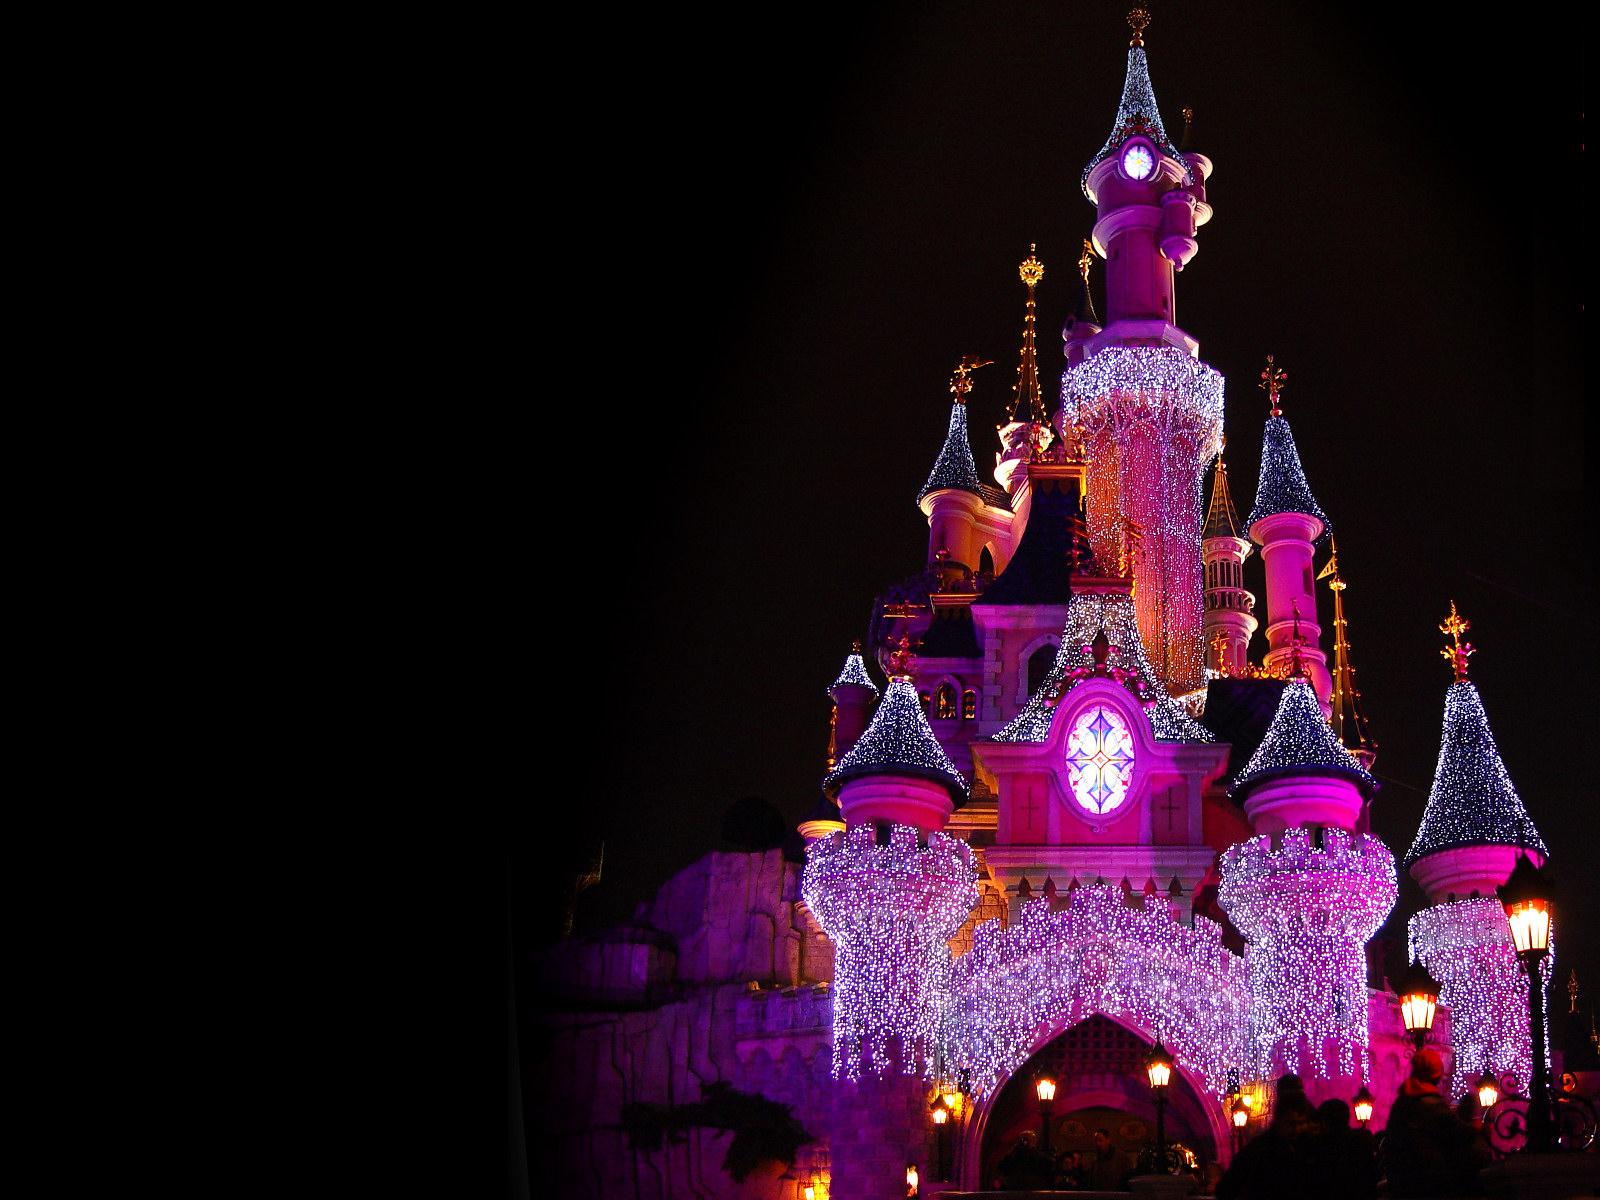 Disney Desktop HD Wallpaper 1600x1200